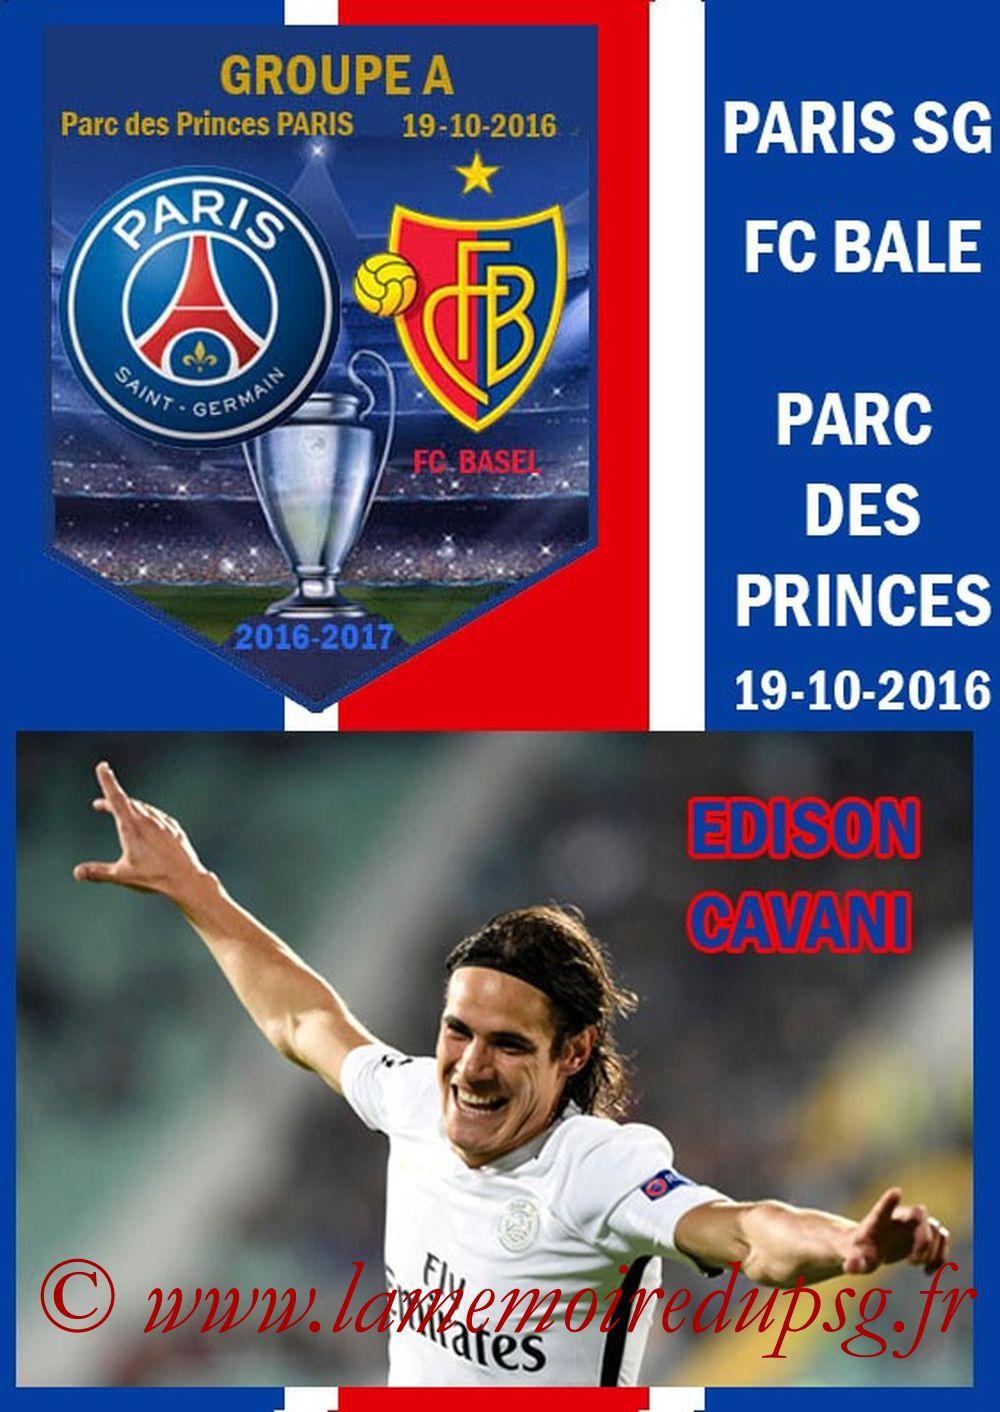 2016-10-19  PSG-Bale (3ème Poule C1, Programme pirate 2)